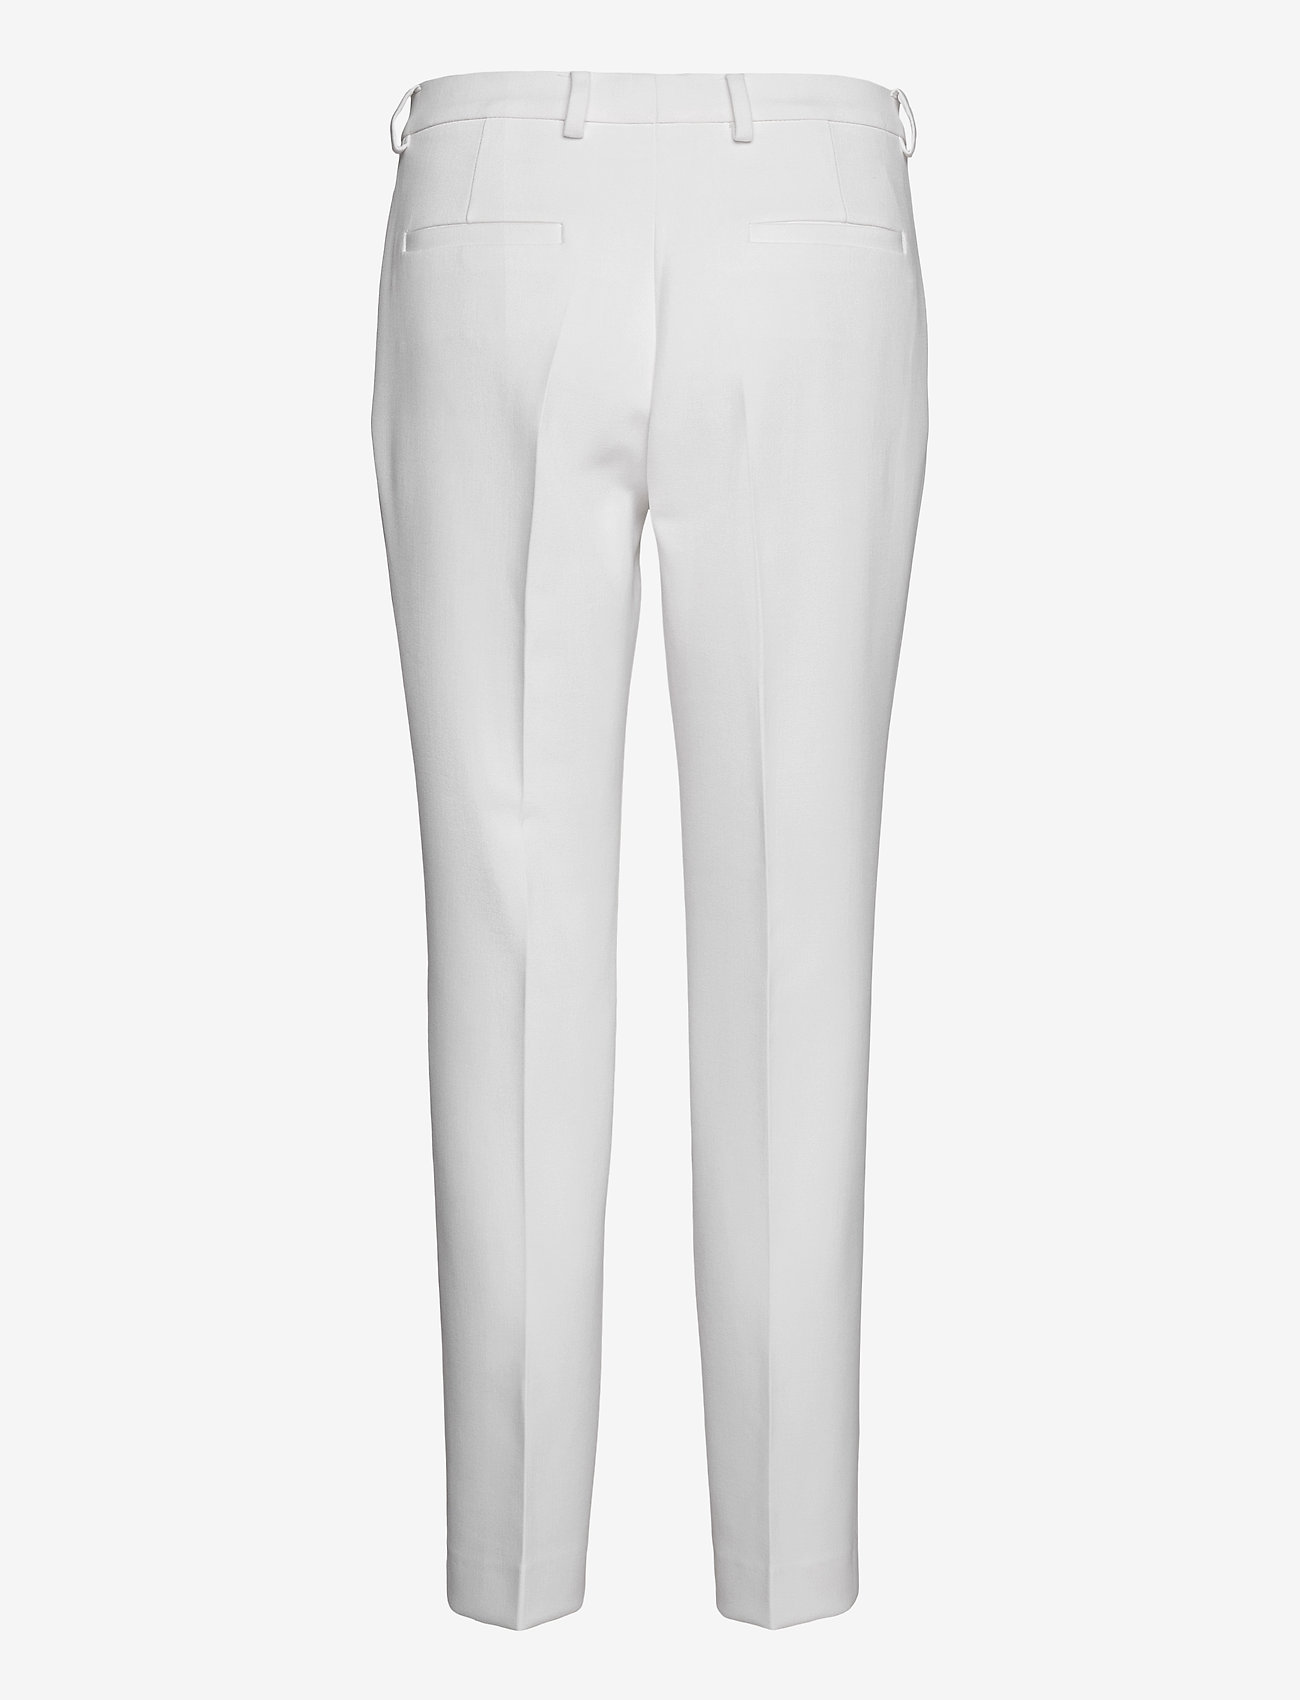 SAND - 3596 - Dori A - broeken med straight ben - optical white - 1